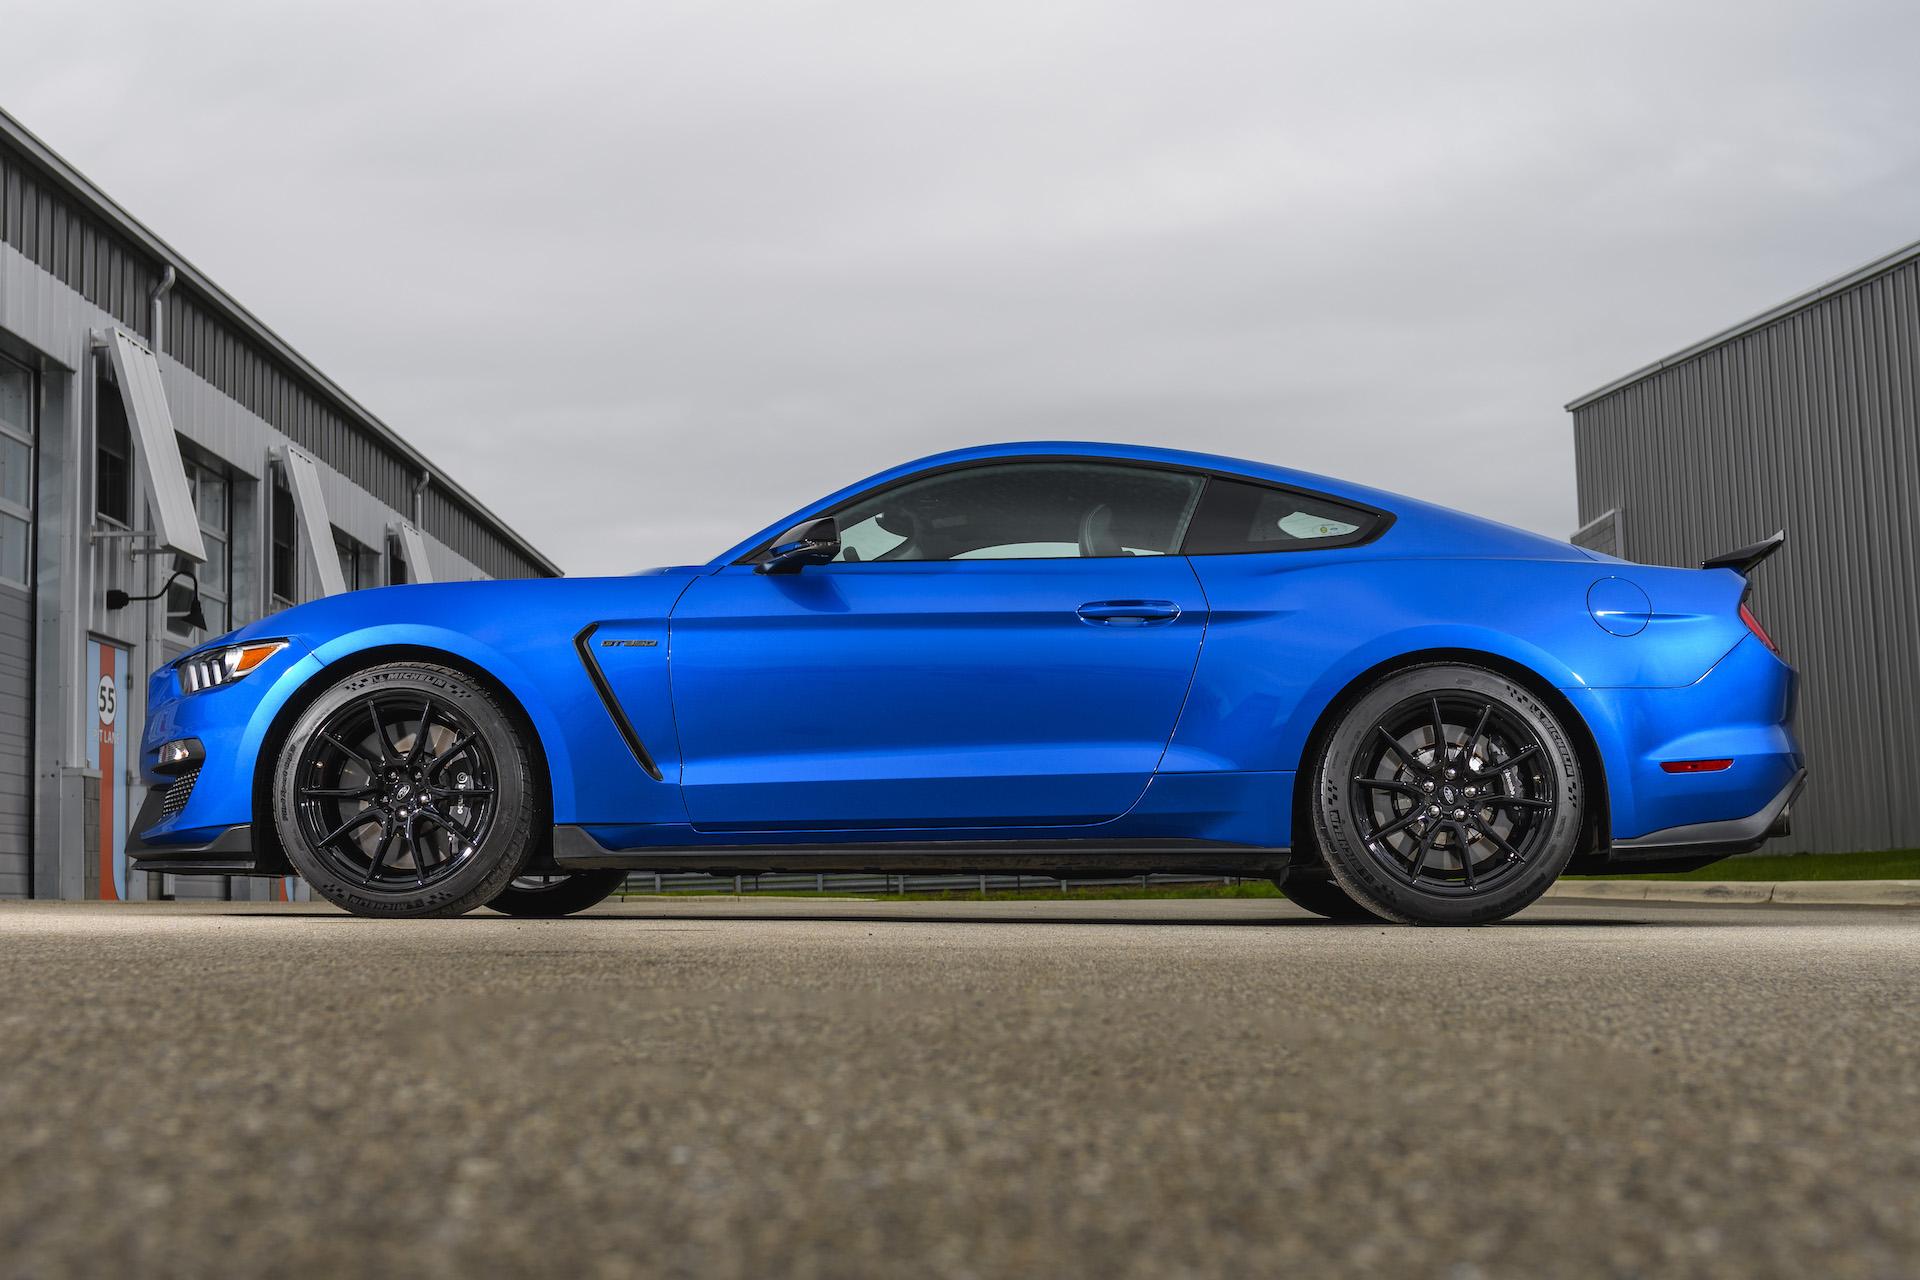 2019 Mustang Shelby Gt350 Hyundai N Electric Sports Car Ferrari Hybrid Supercar Today S News